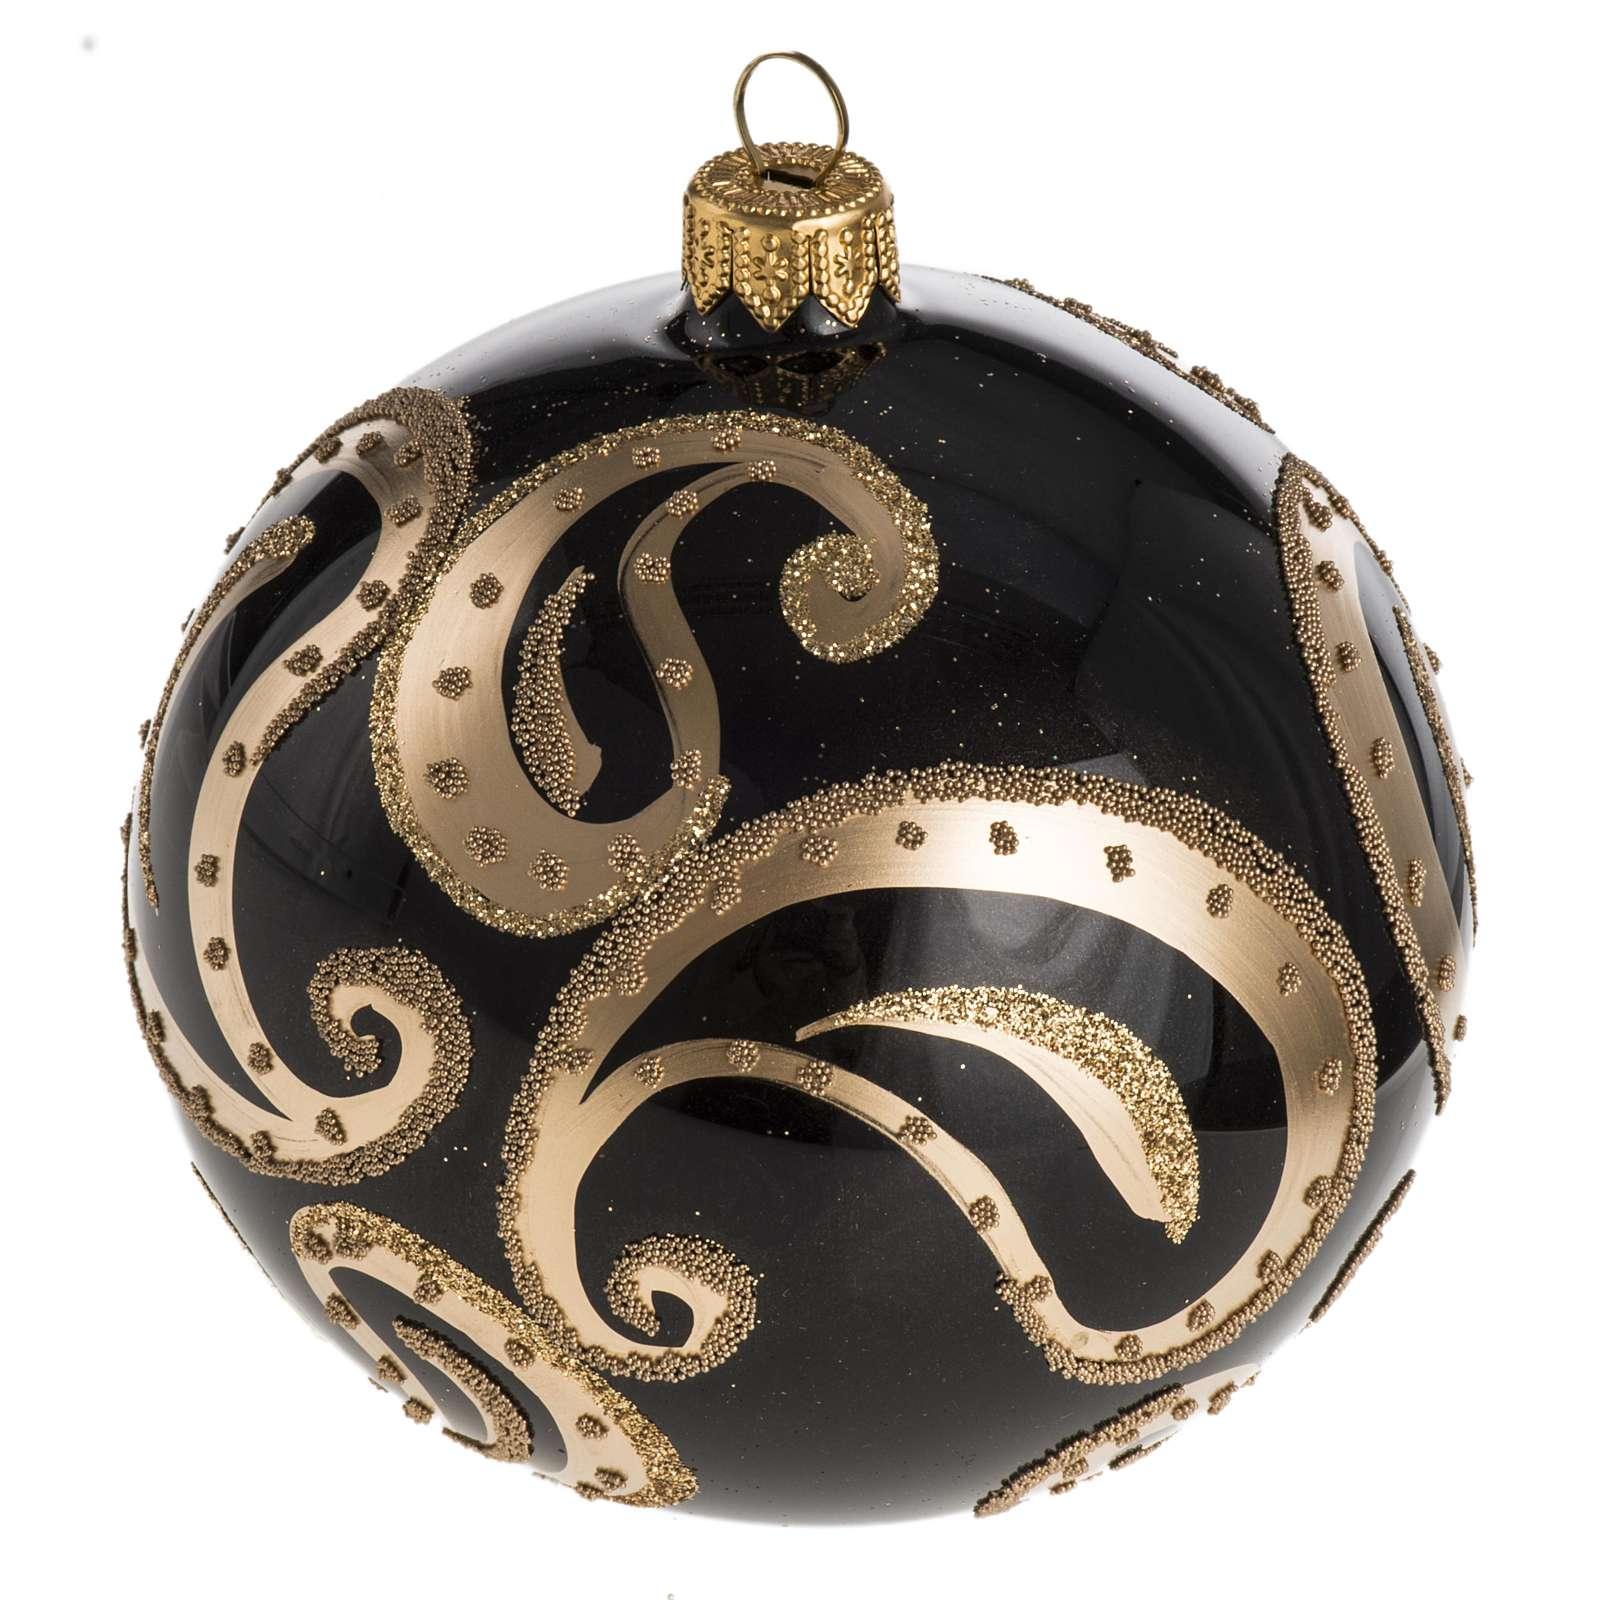 Boule de Noel noire or 10 cm 4